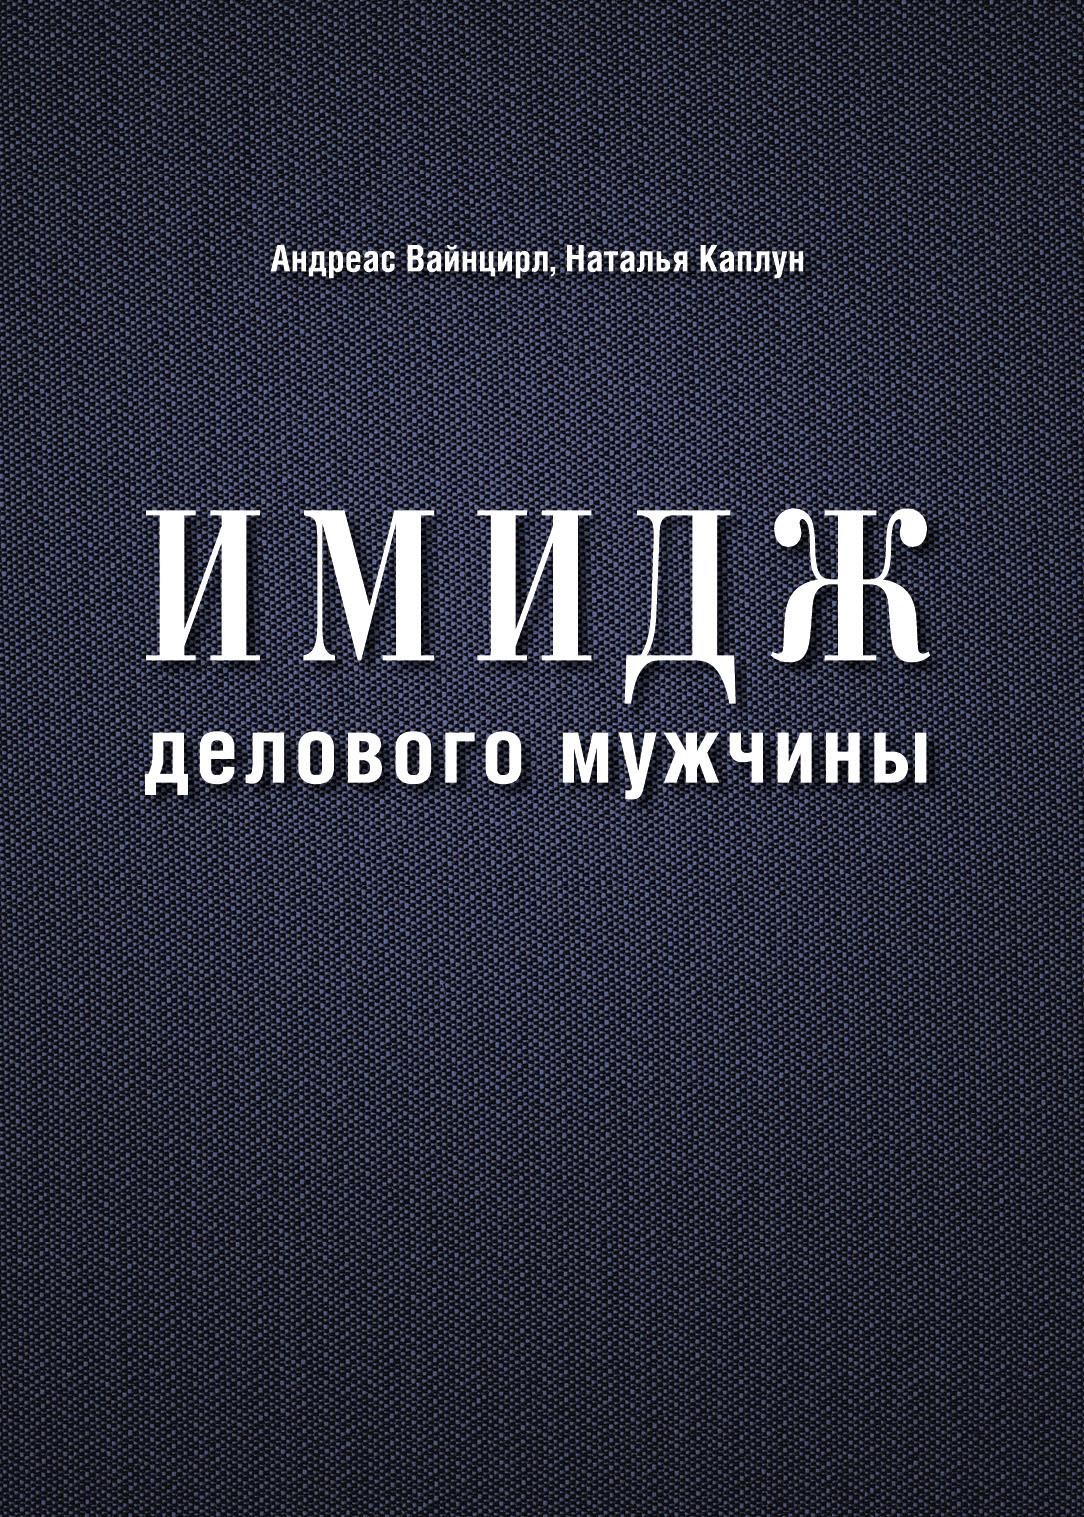 Андреас Вайнцирл Имидж делового мужчины аксессуары для делового мужчины